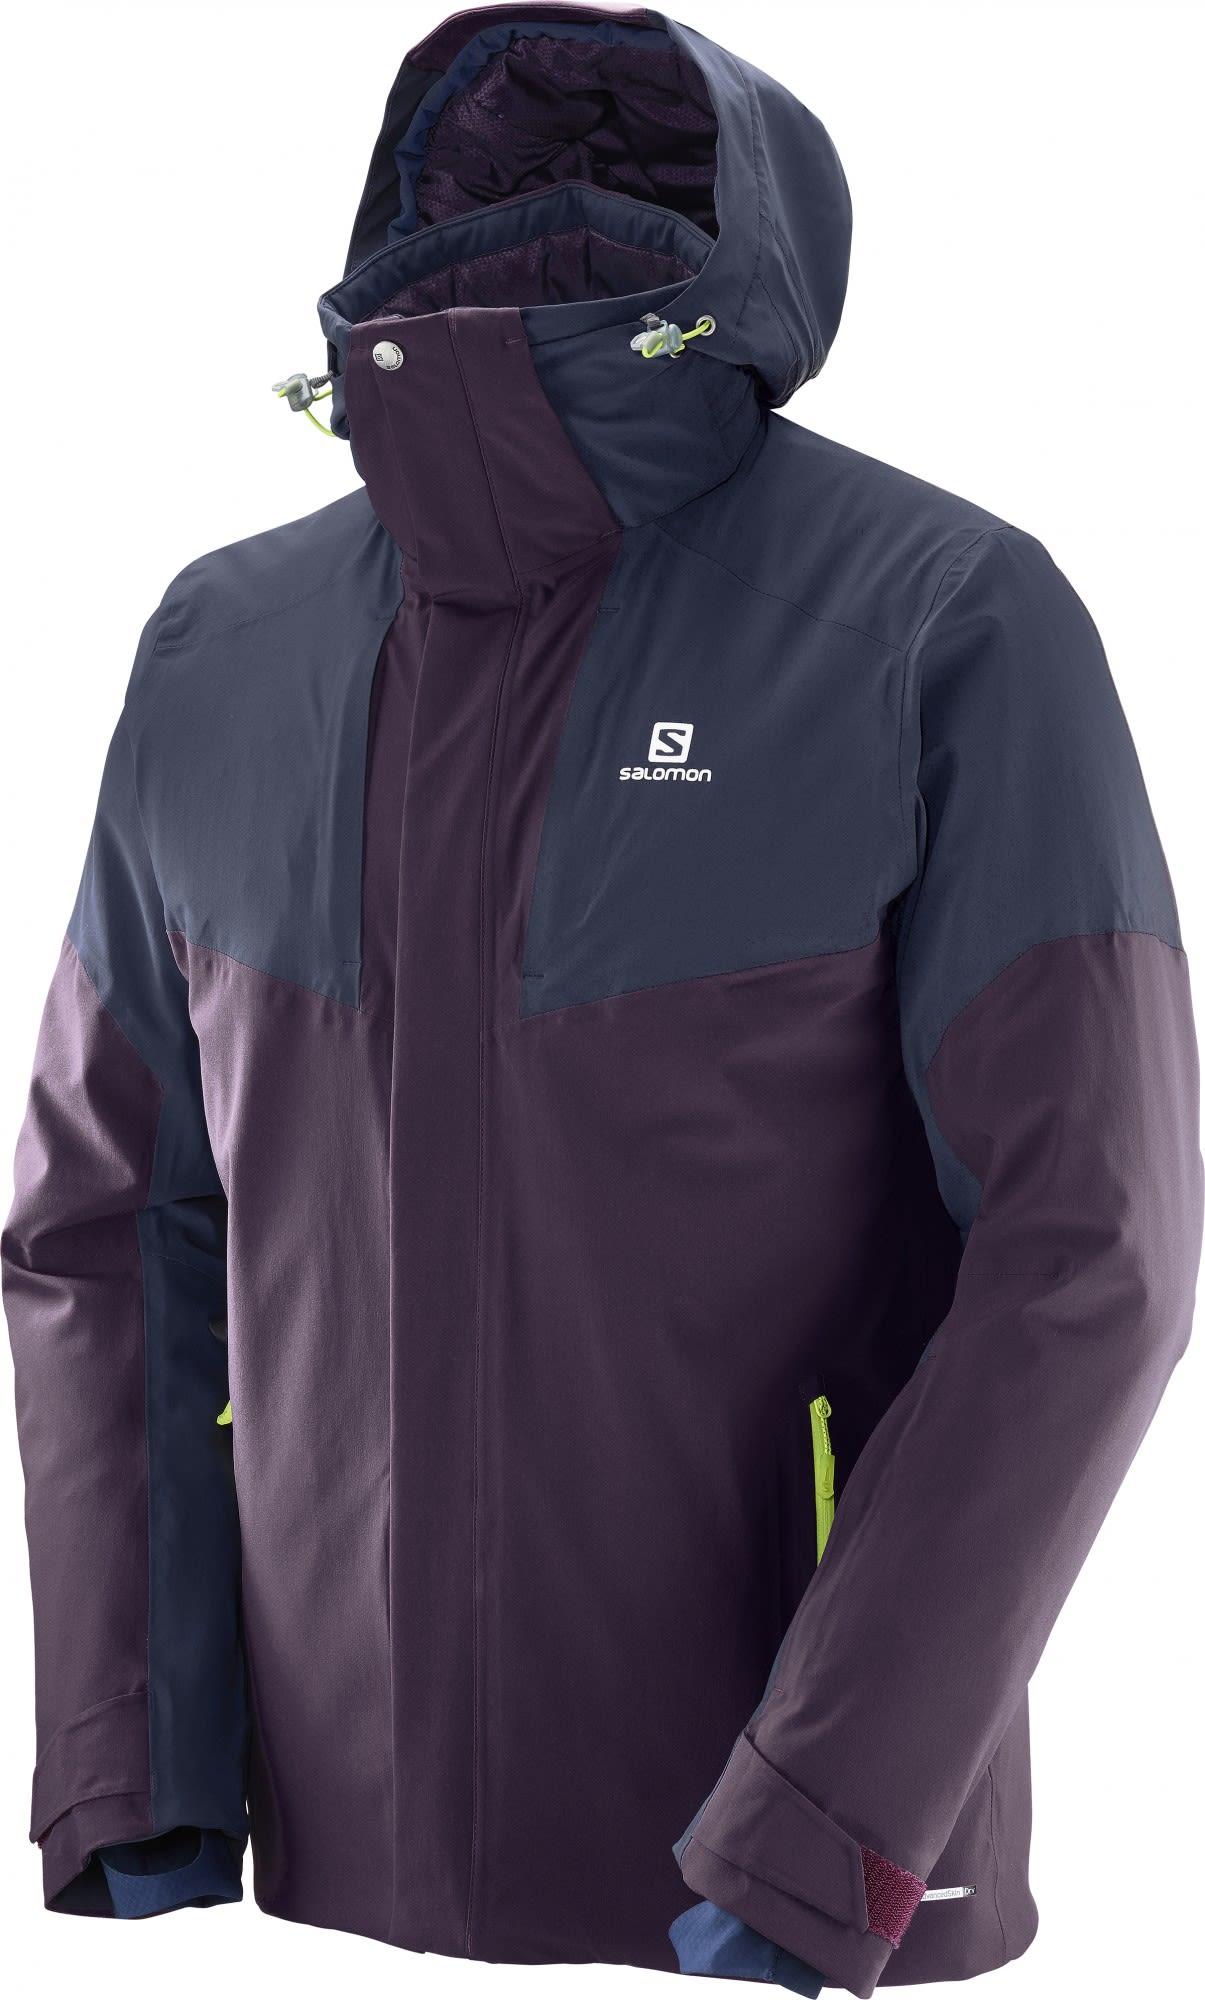 Salomon M Icerocket Jacket (Modell Winter 2017)   Herren Freizeitjacke